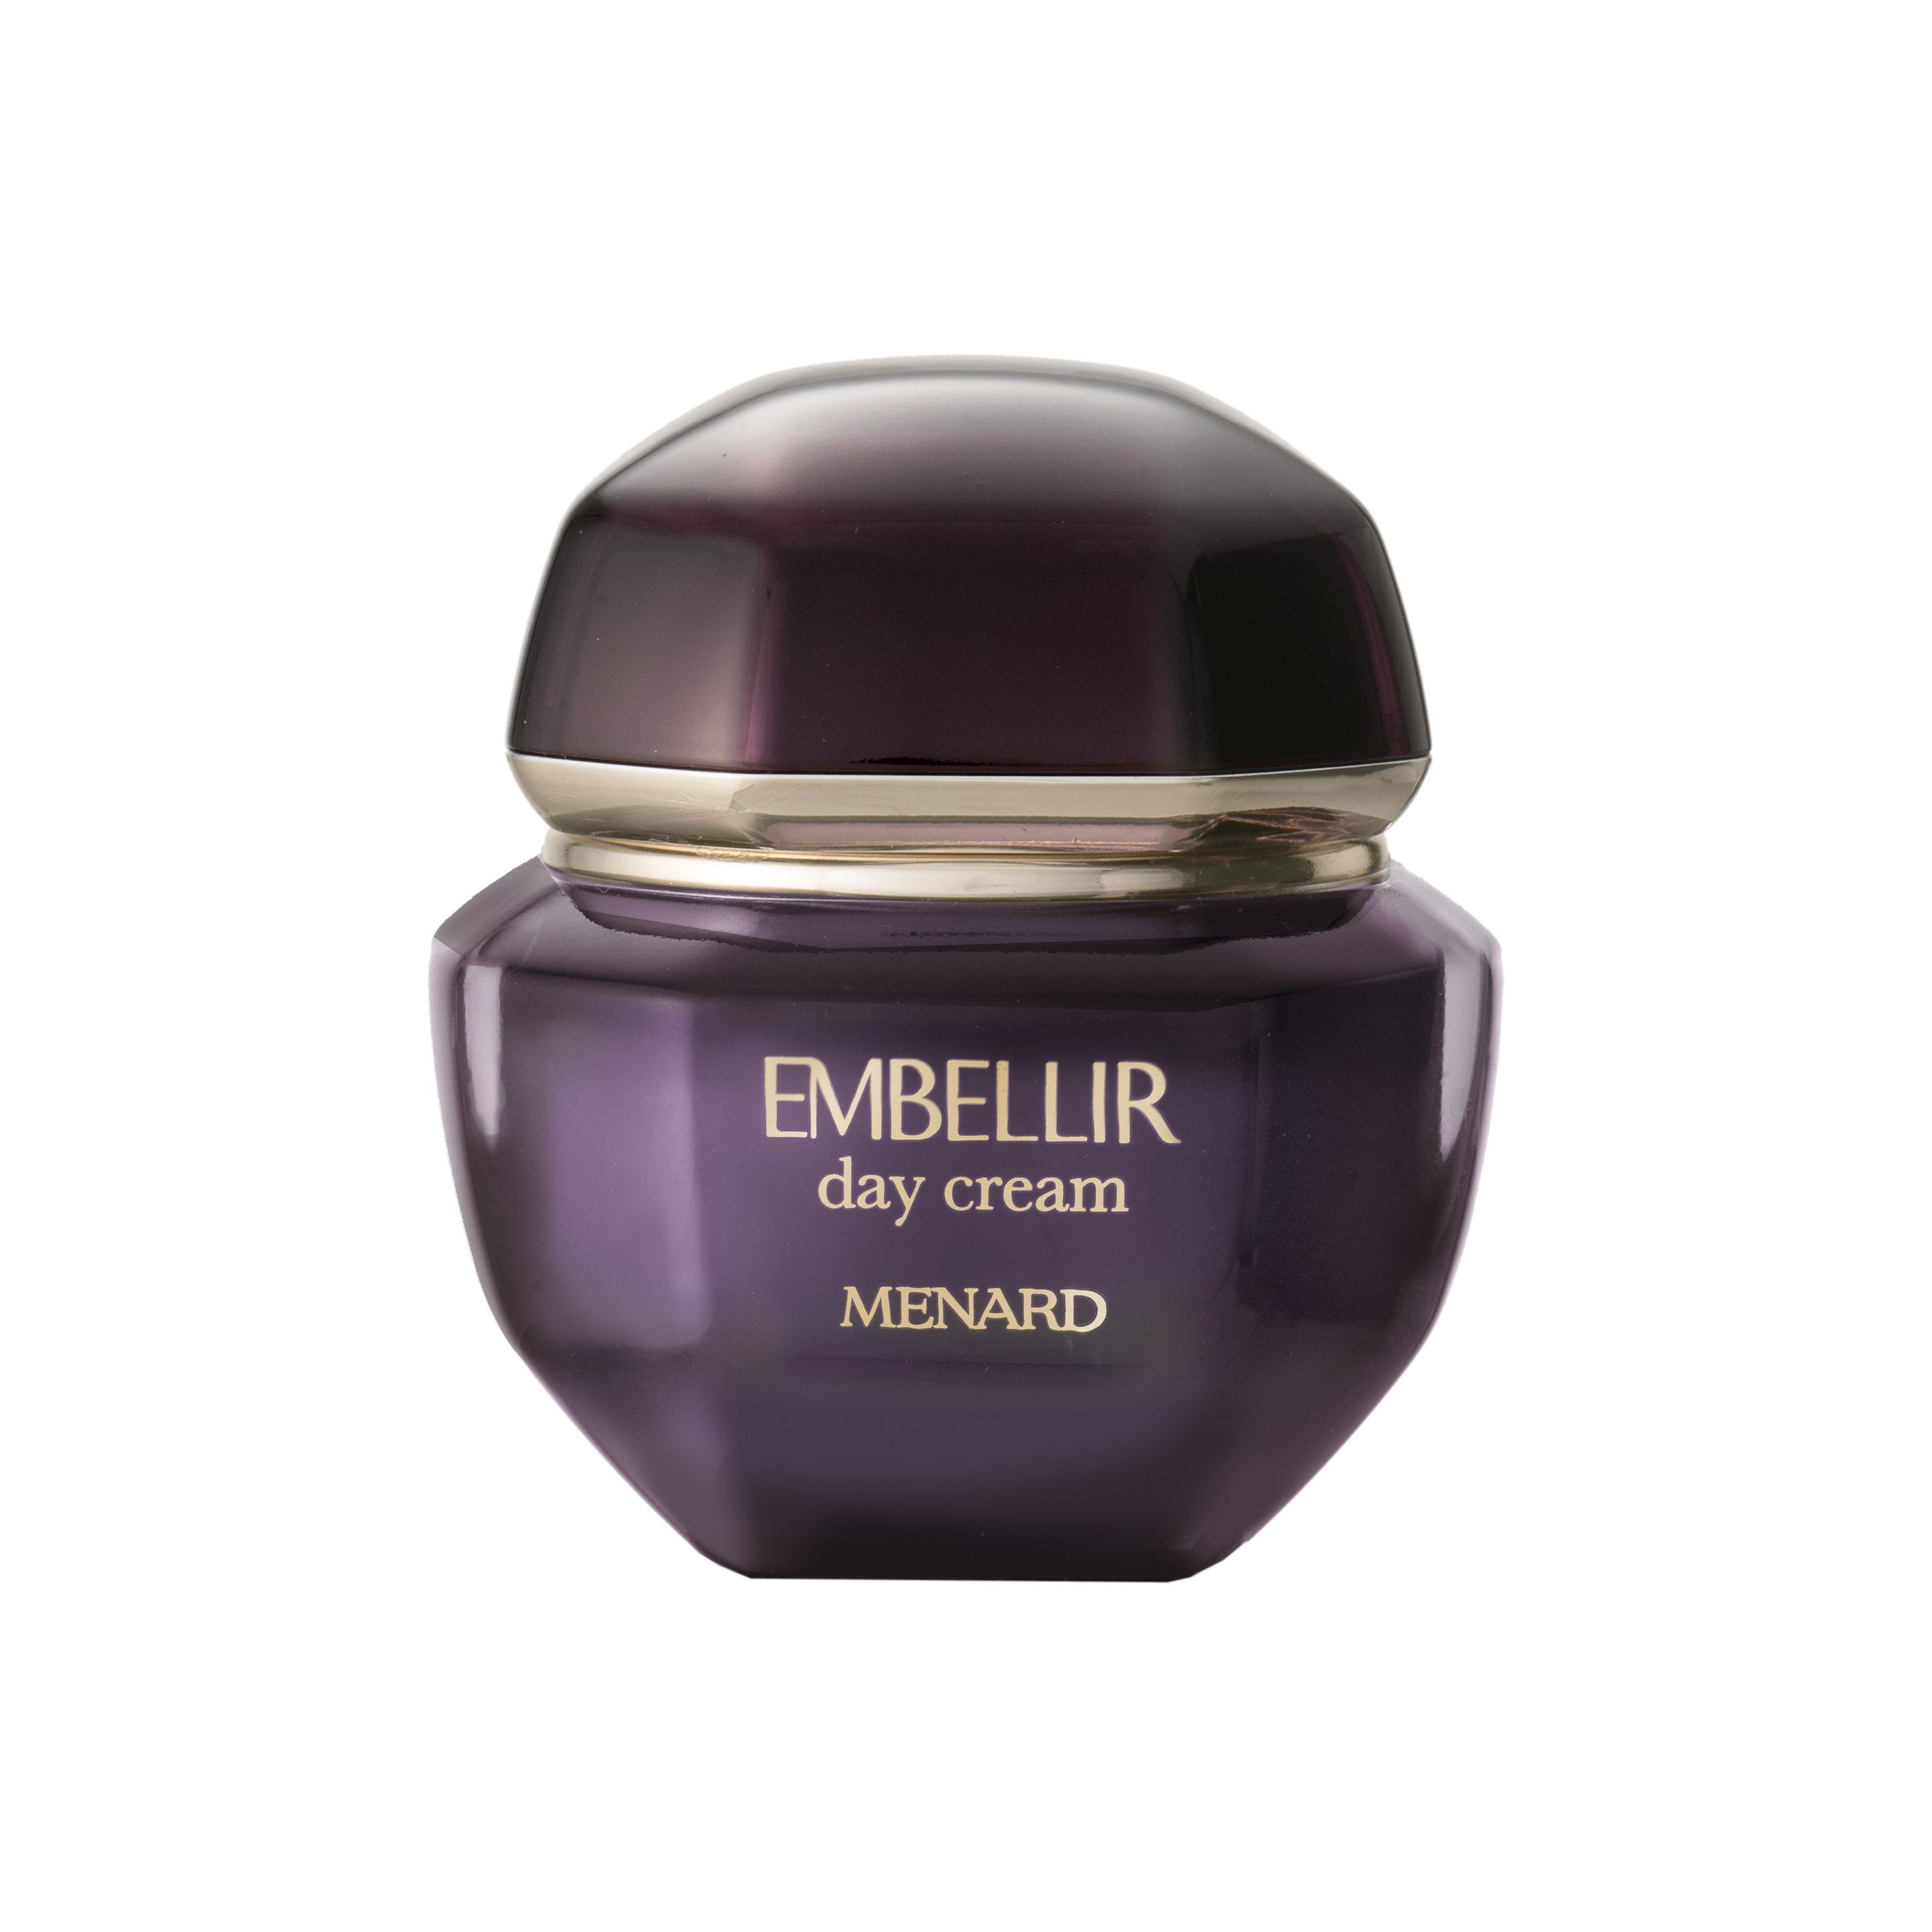 Menard - Embellir Day Cream